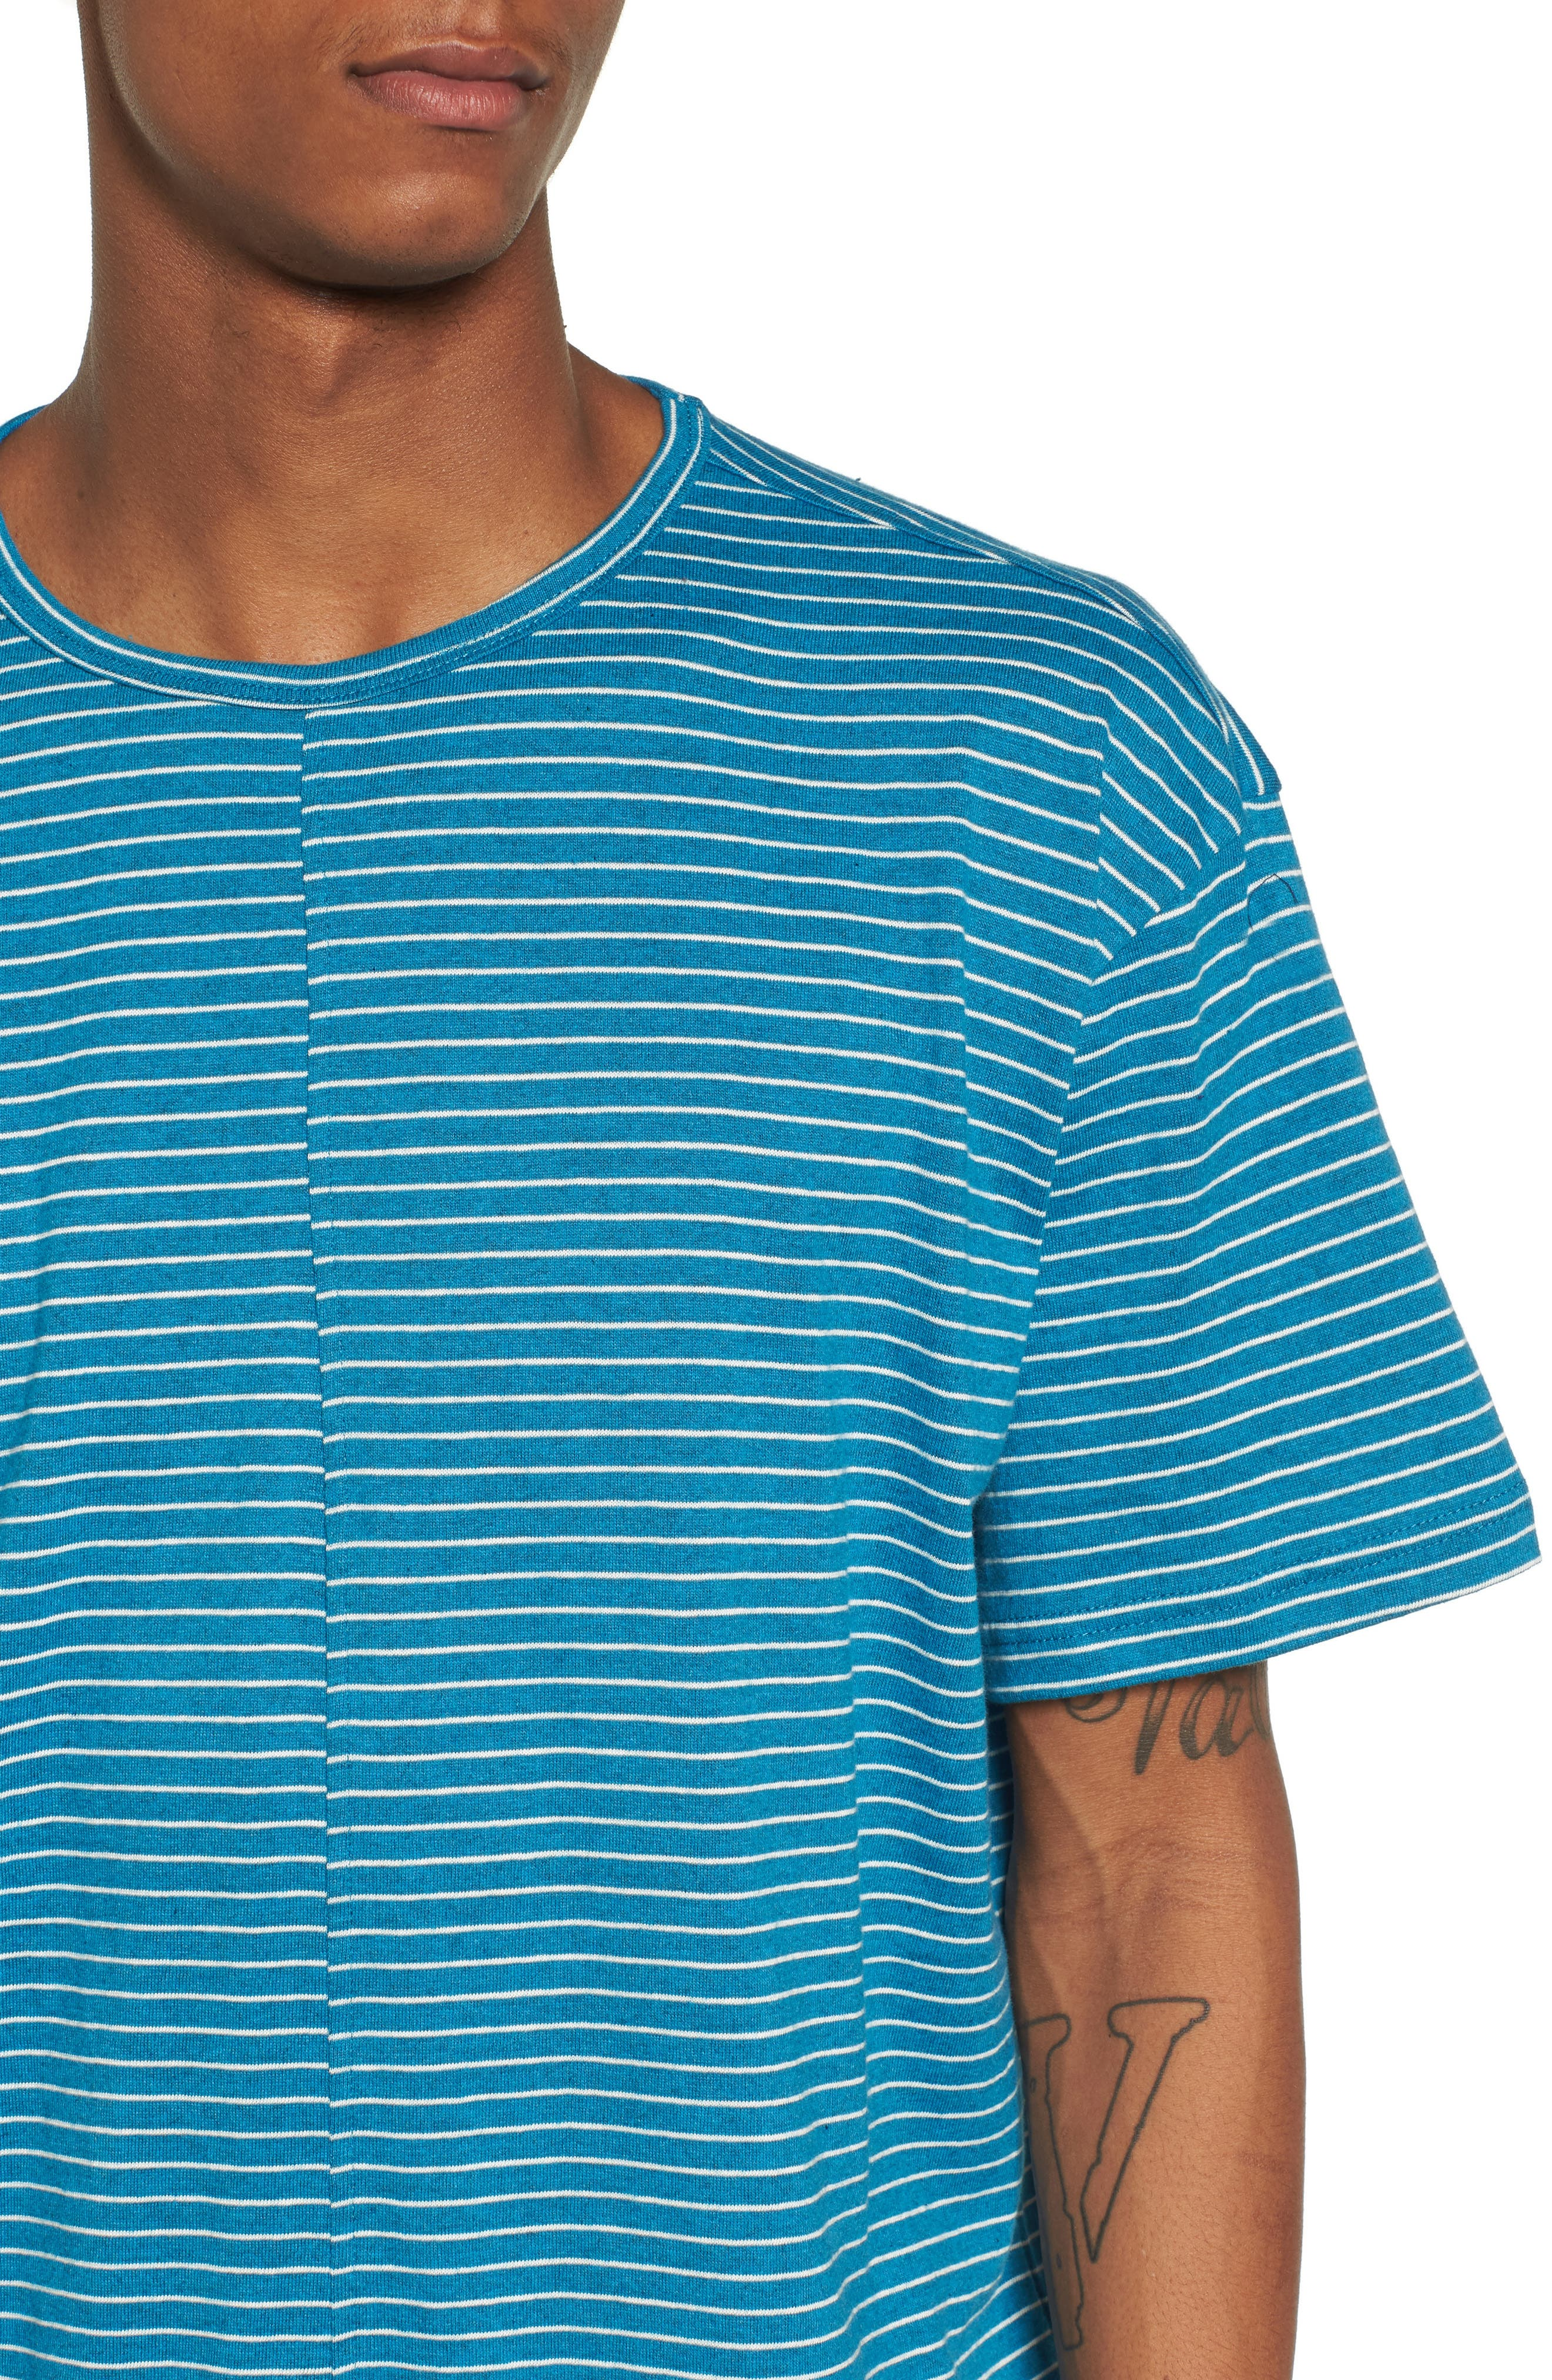 Boost T-Shirt,                             Alternate thumbnail 4, color,                             400